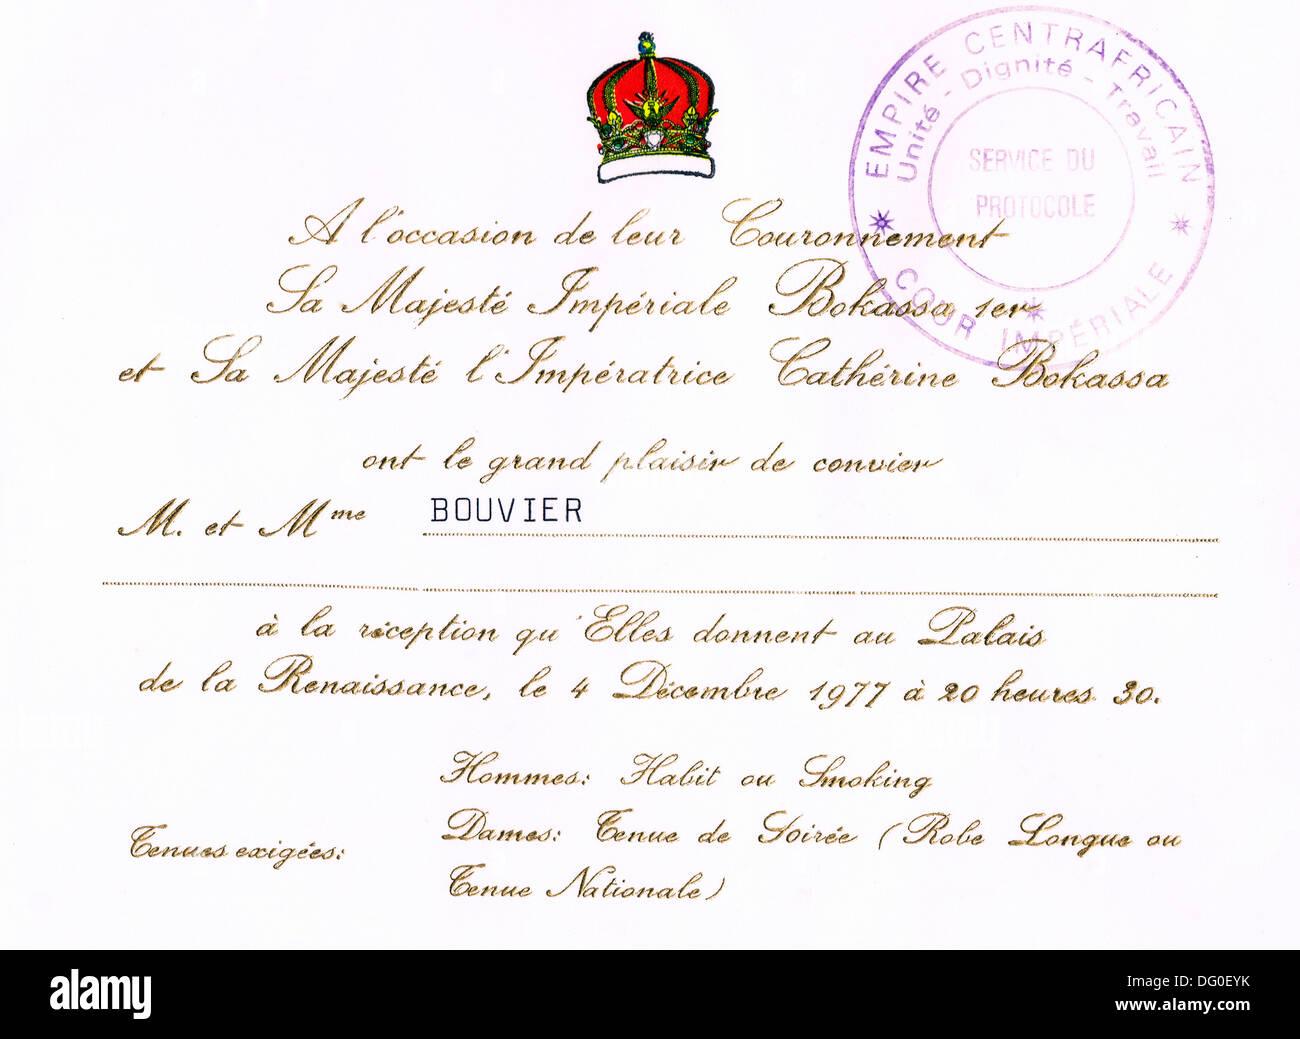 Genuine invitation for the coronation of Emperor Bokassa 1st (central african republic) - Stock Image